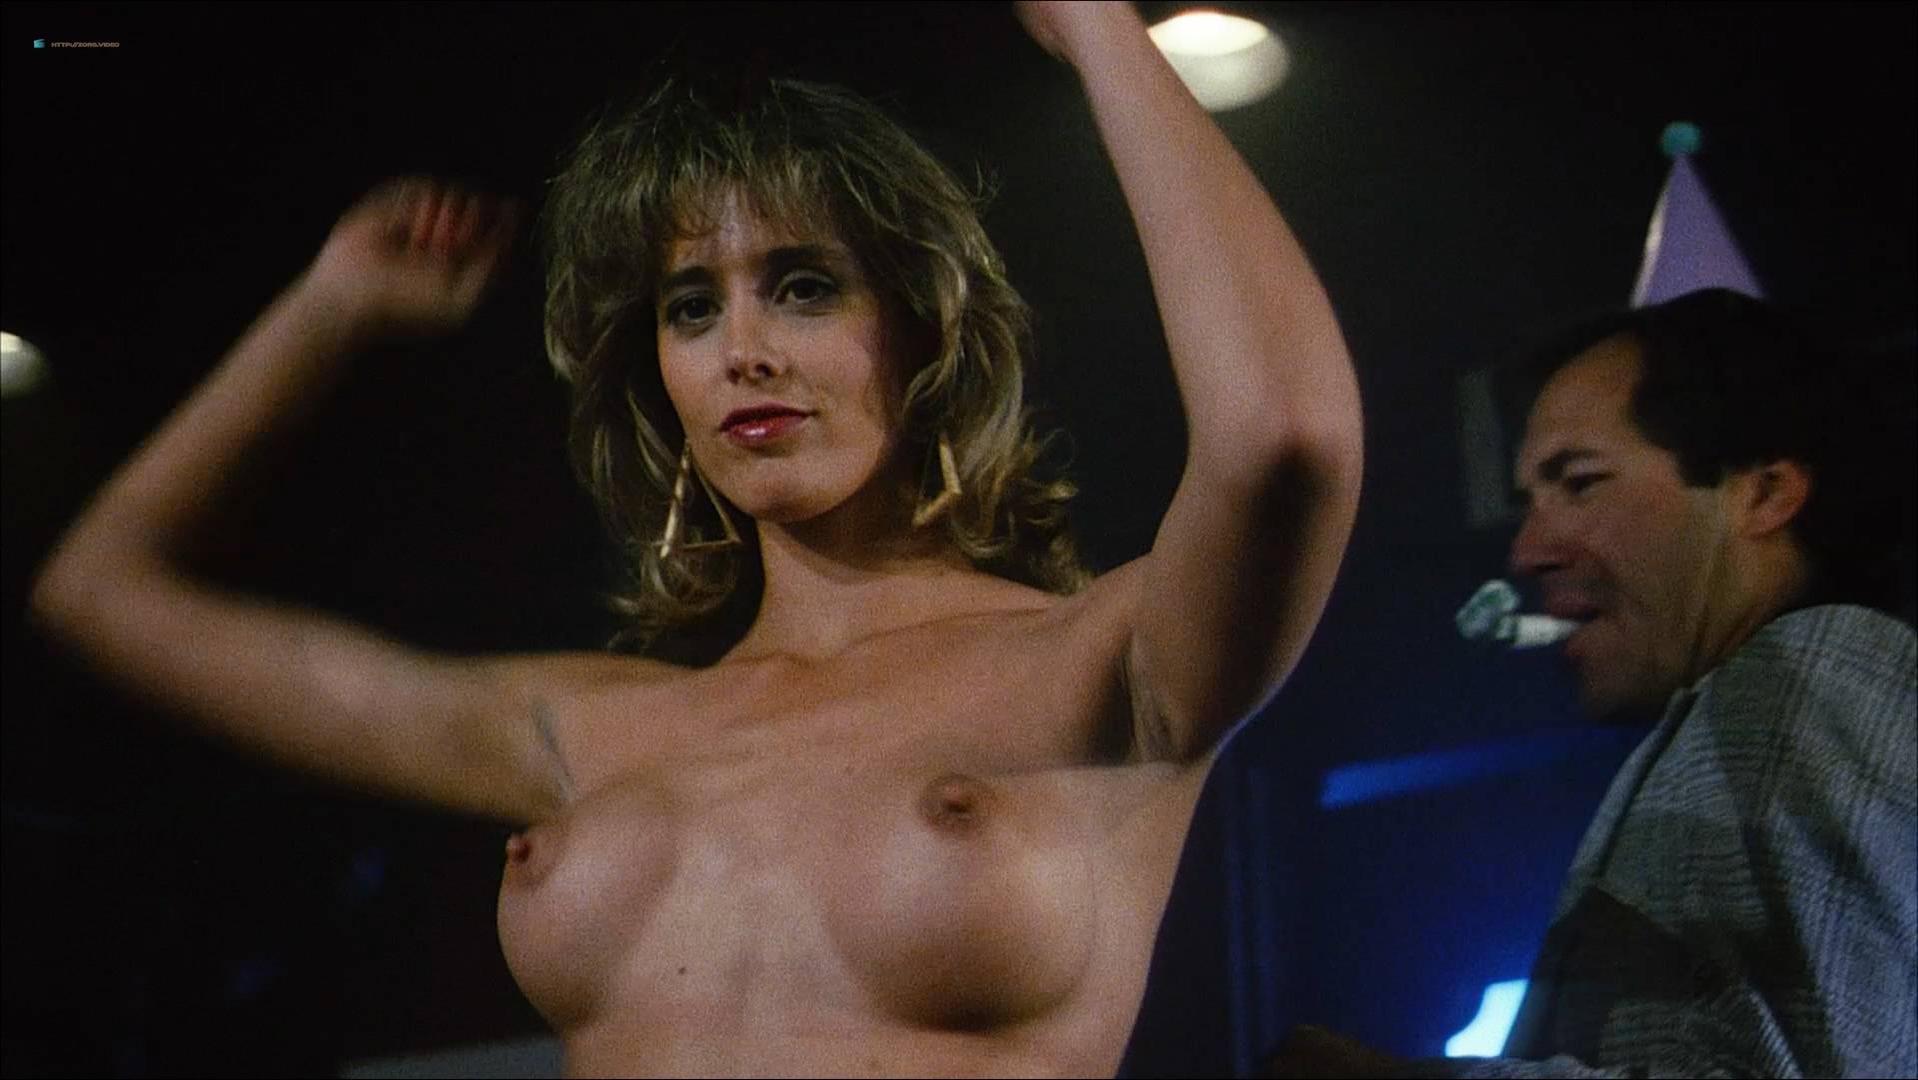 actress Lisa marie nude smith